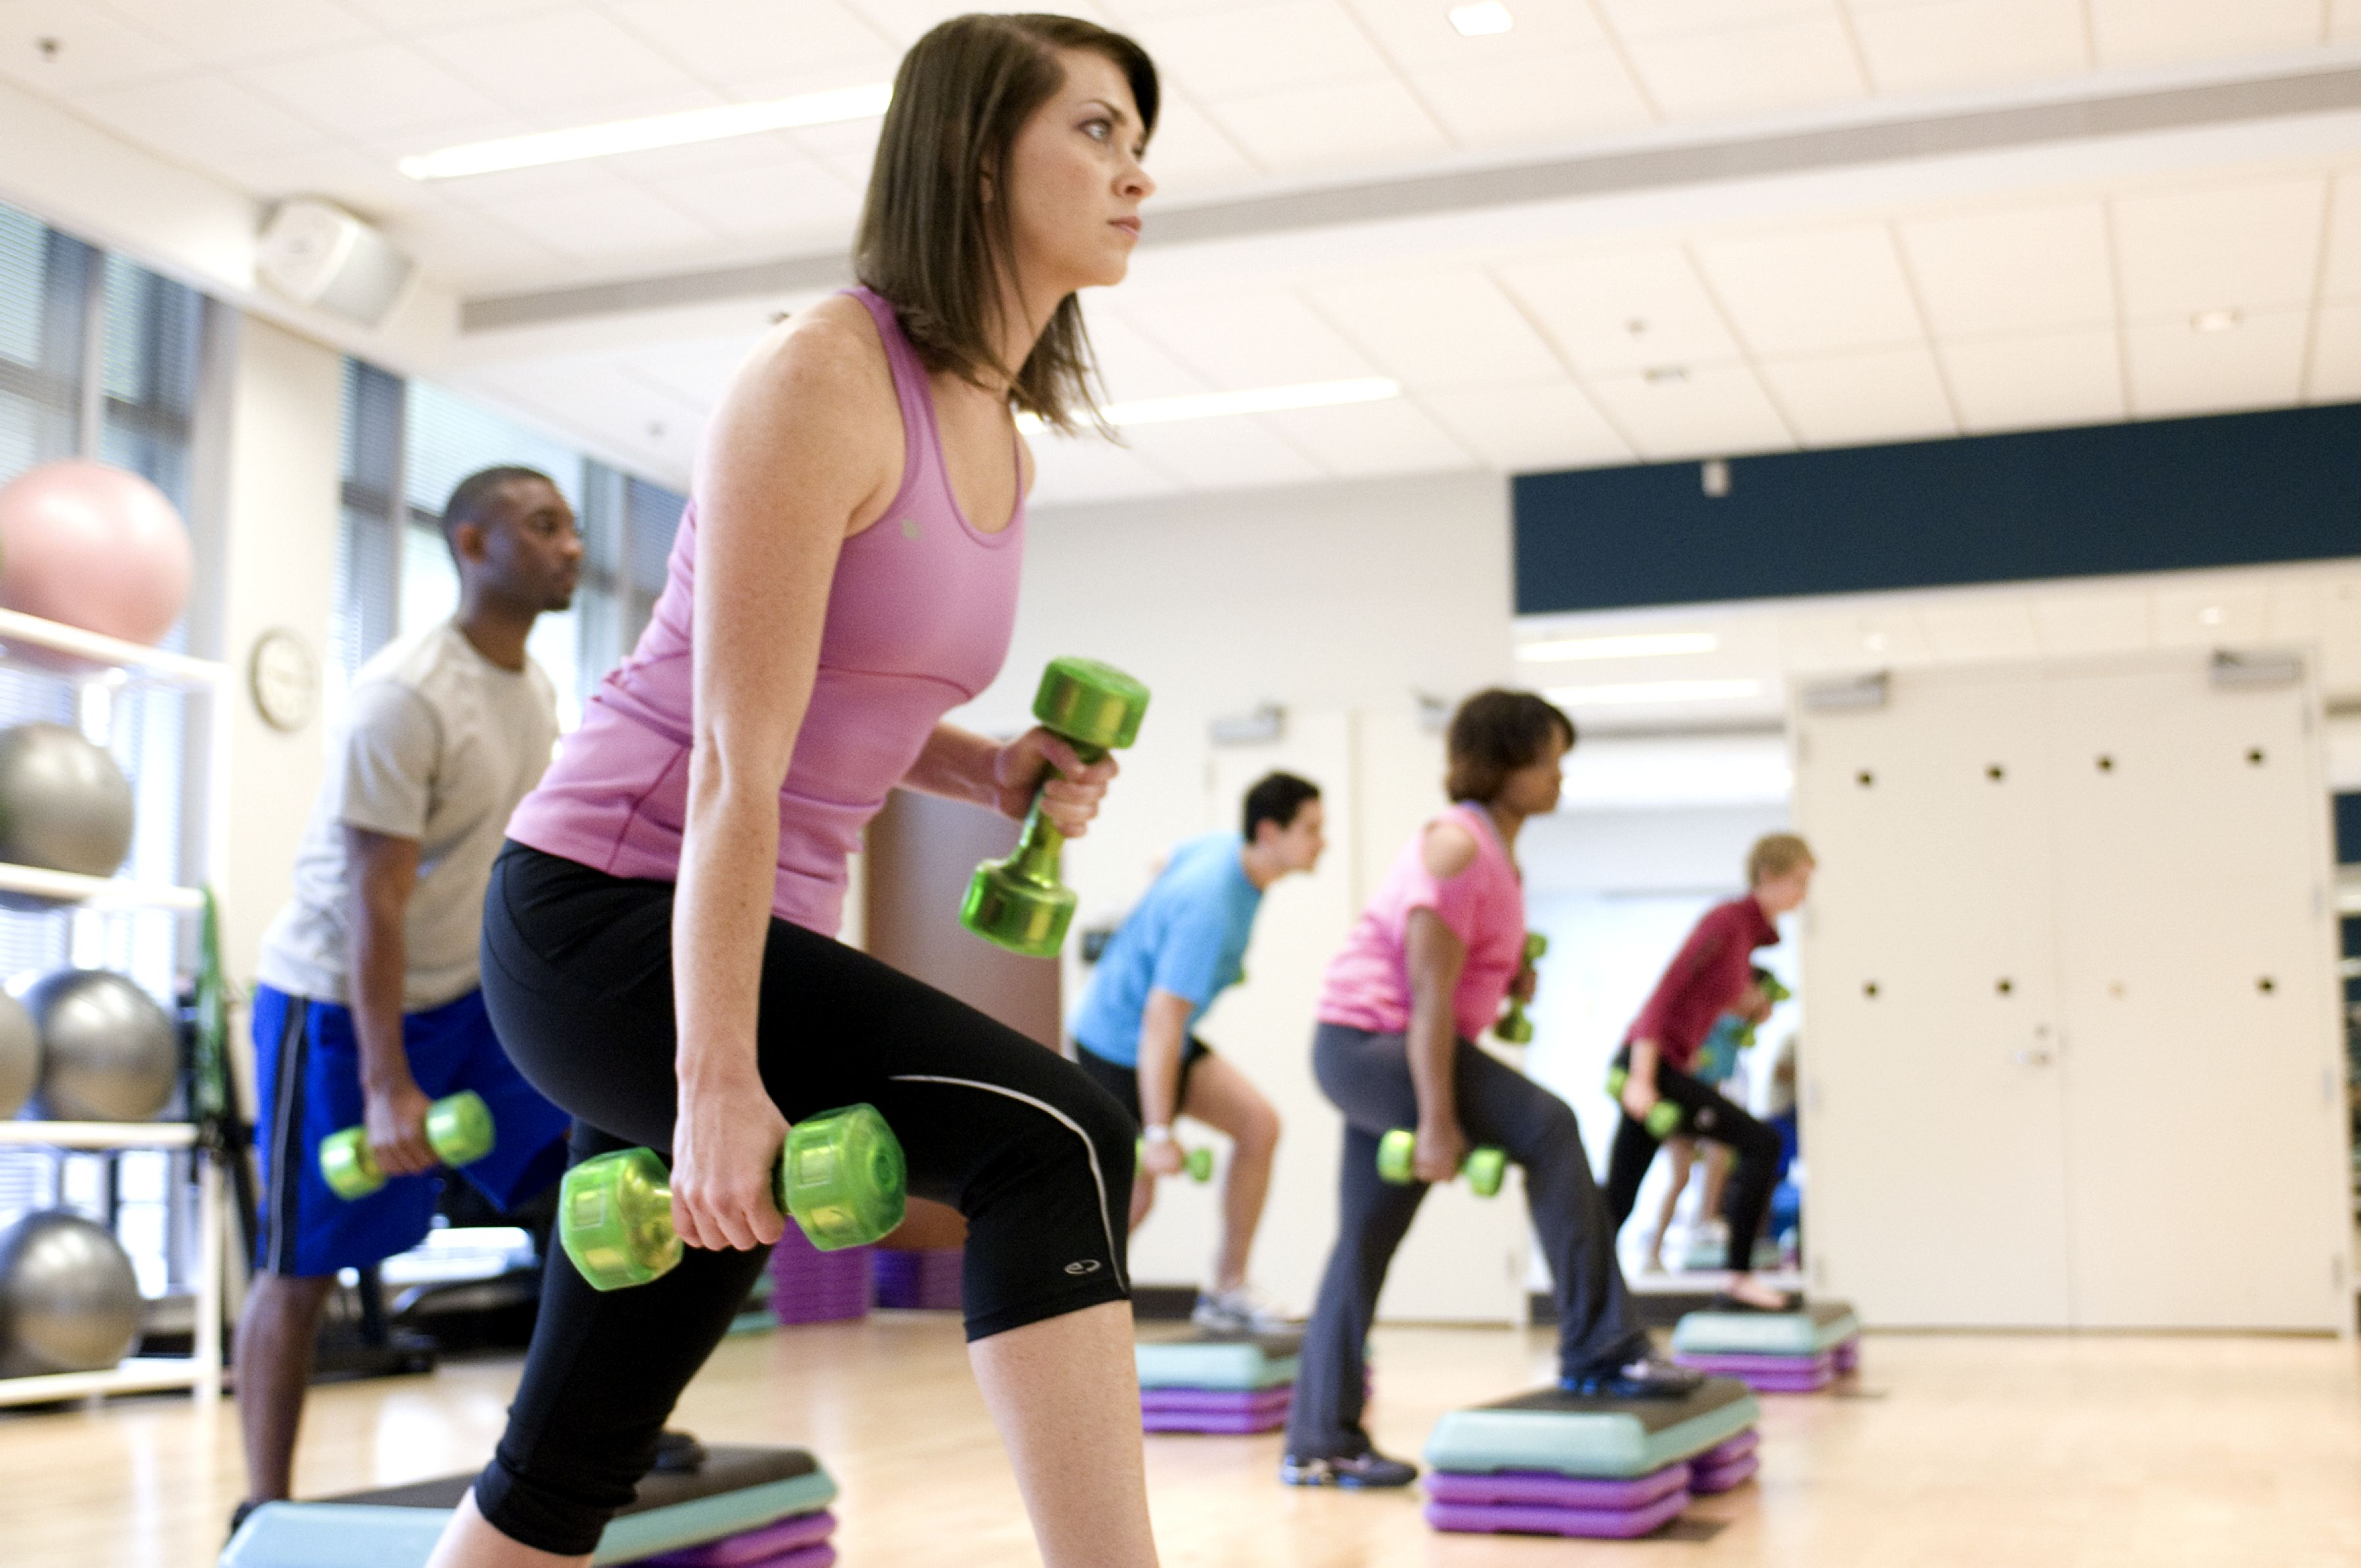 pratiquer sport motivation adultes